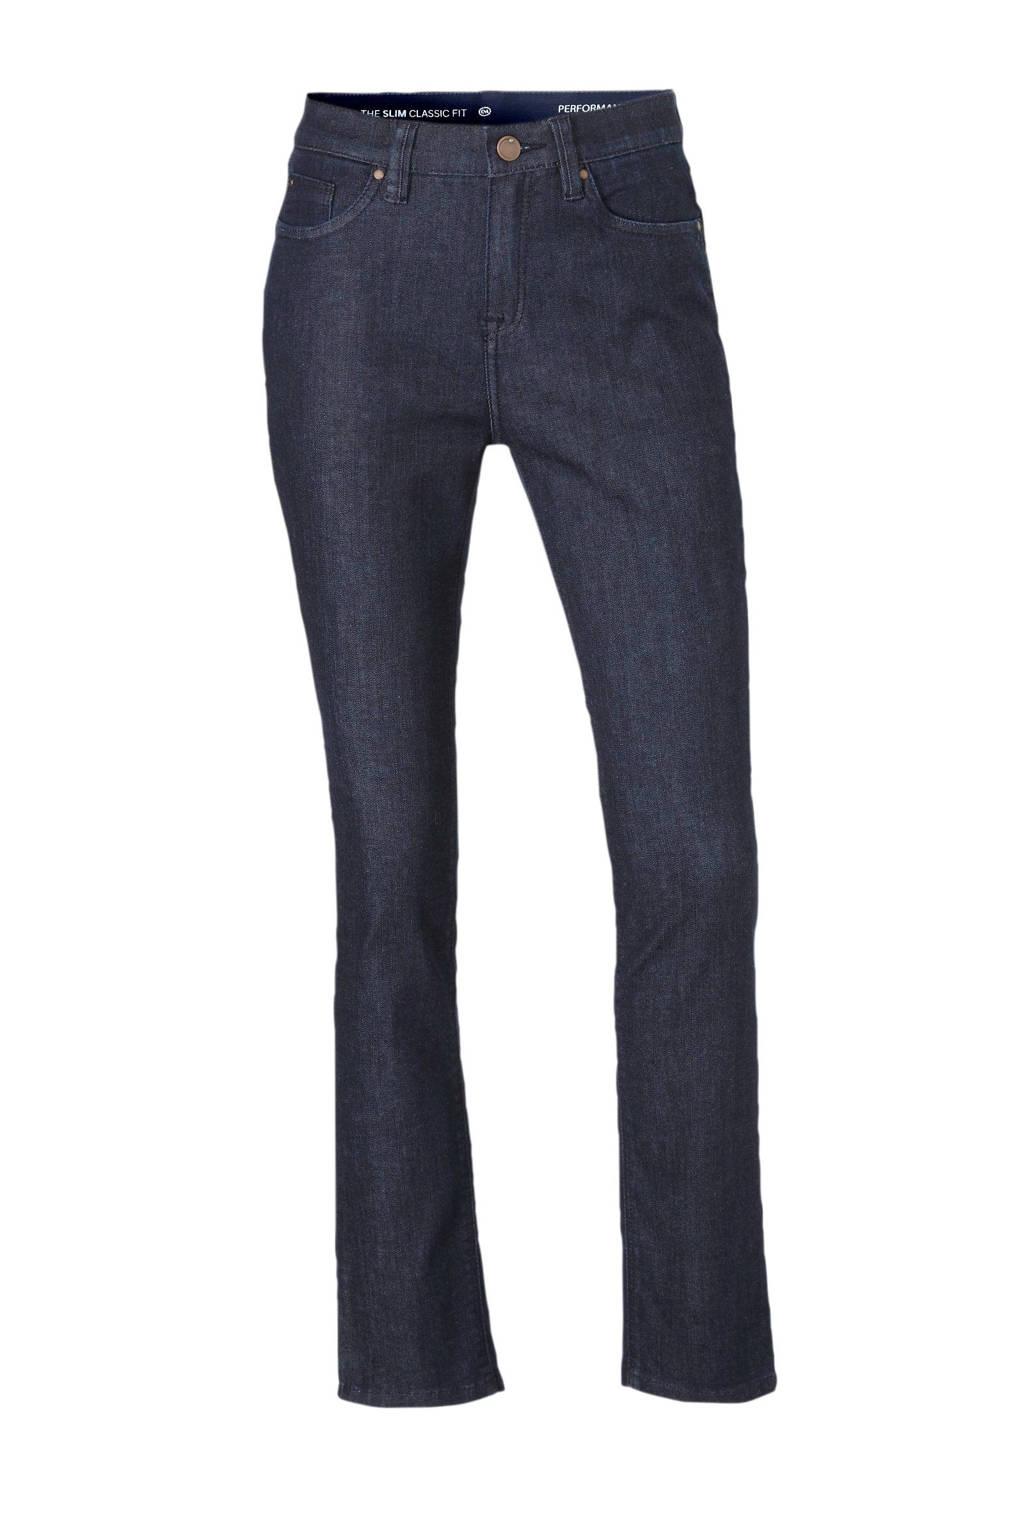 C&A The Denim high waist slim fit jeans blauw, Blauw